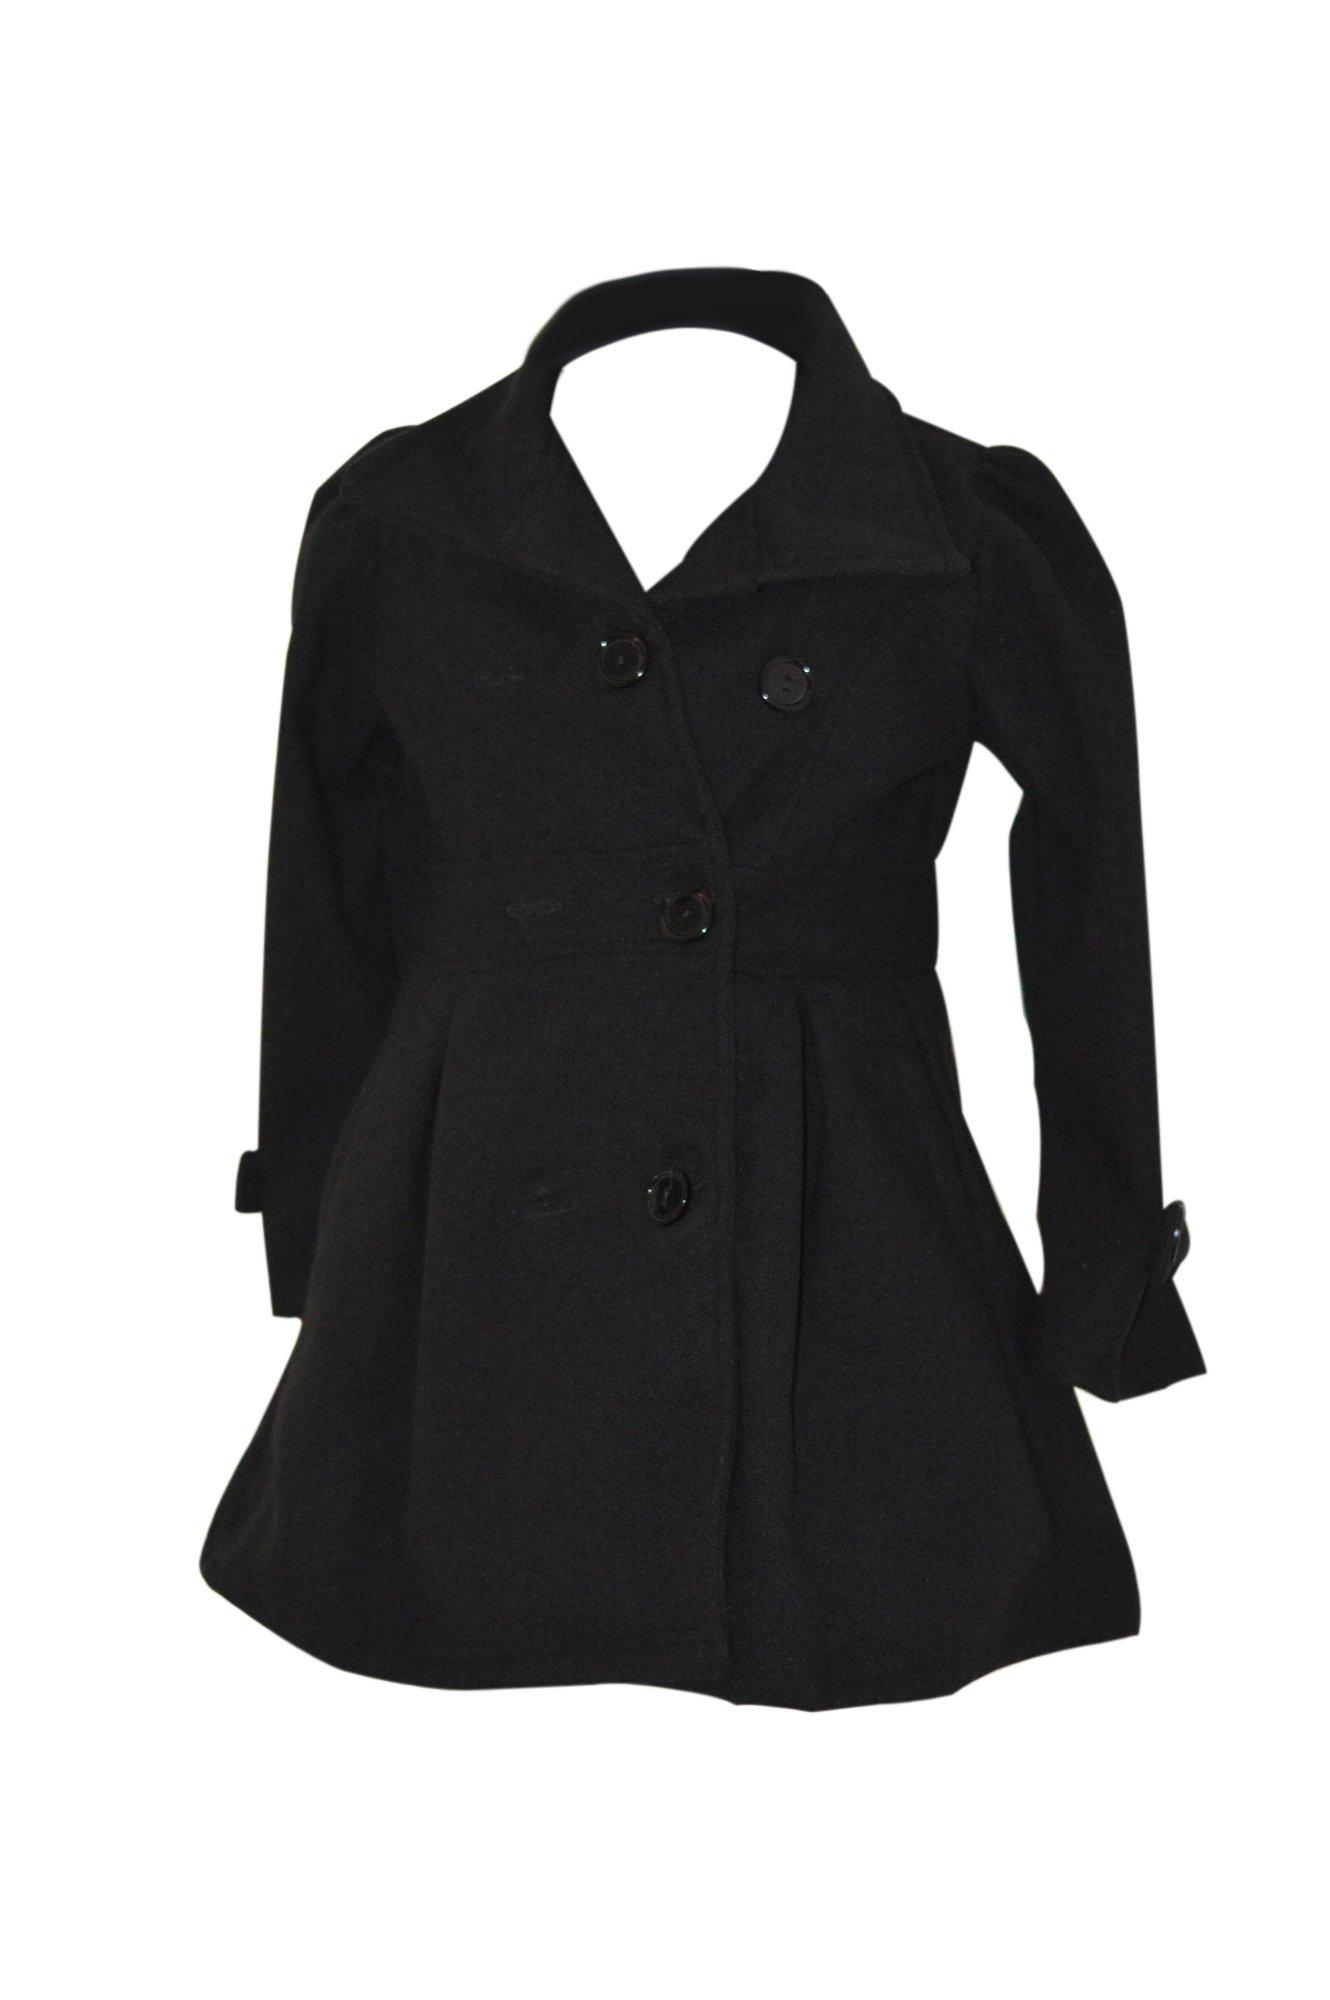 Pea Coat for Girls (Size 8, Black)